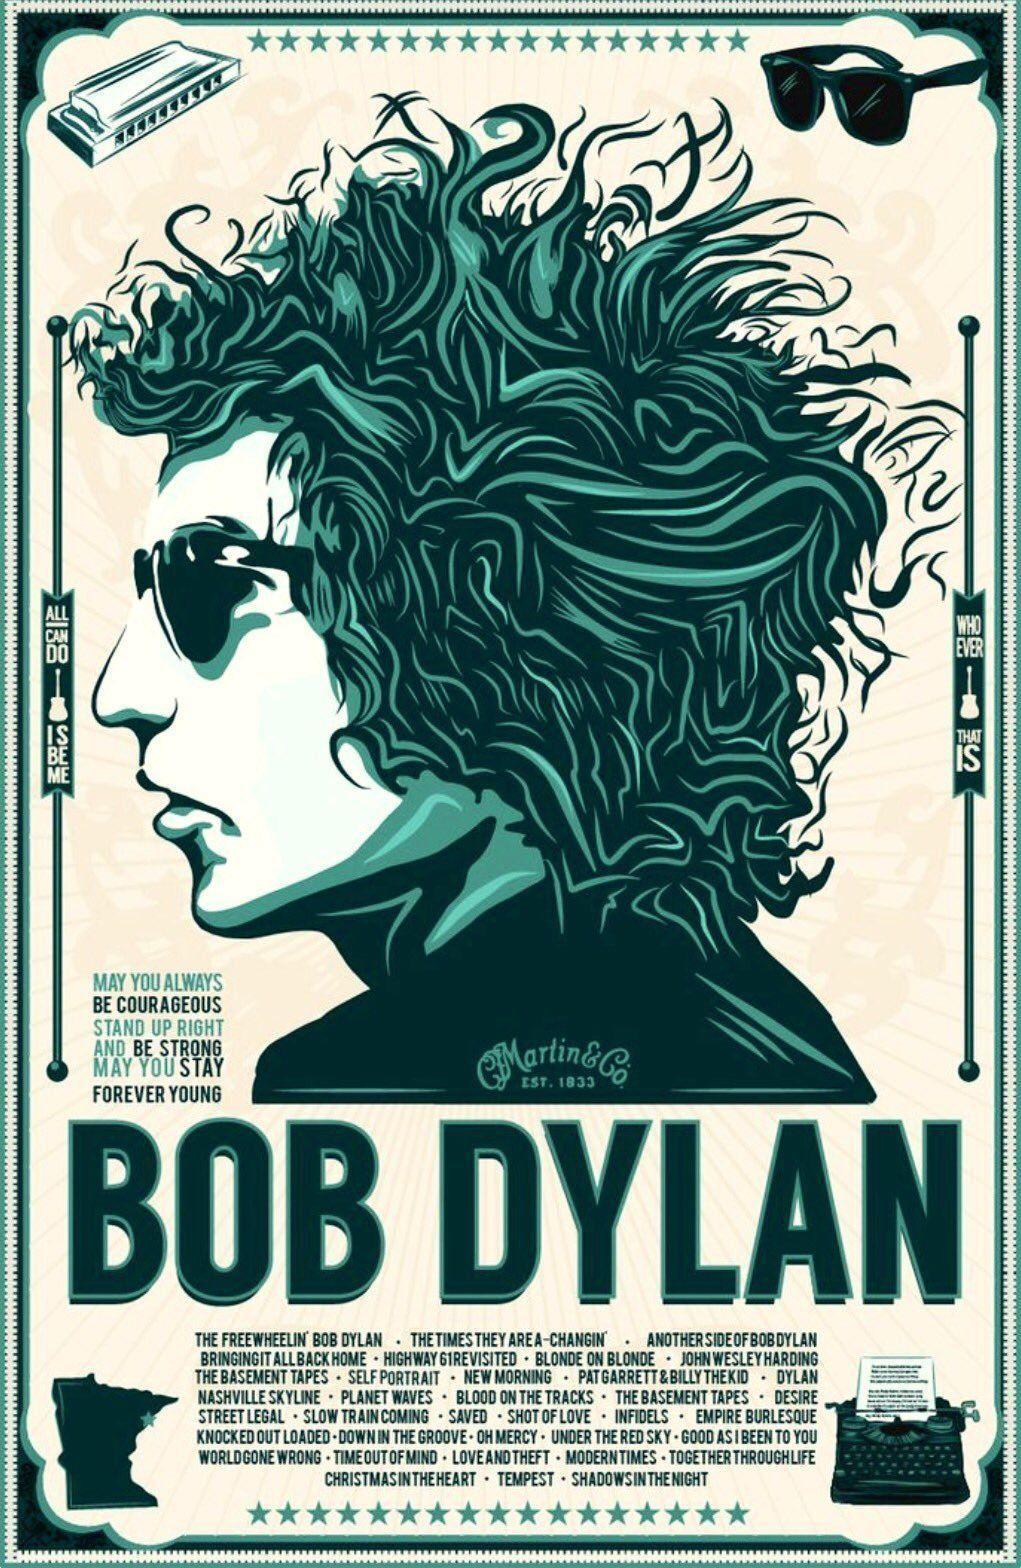 652d30af3 2019 Bob Dylan Music Art Silk Print Poster 24x36inch60x90cm 01 From  Chuy8988, $10.93 | DHgate.Com